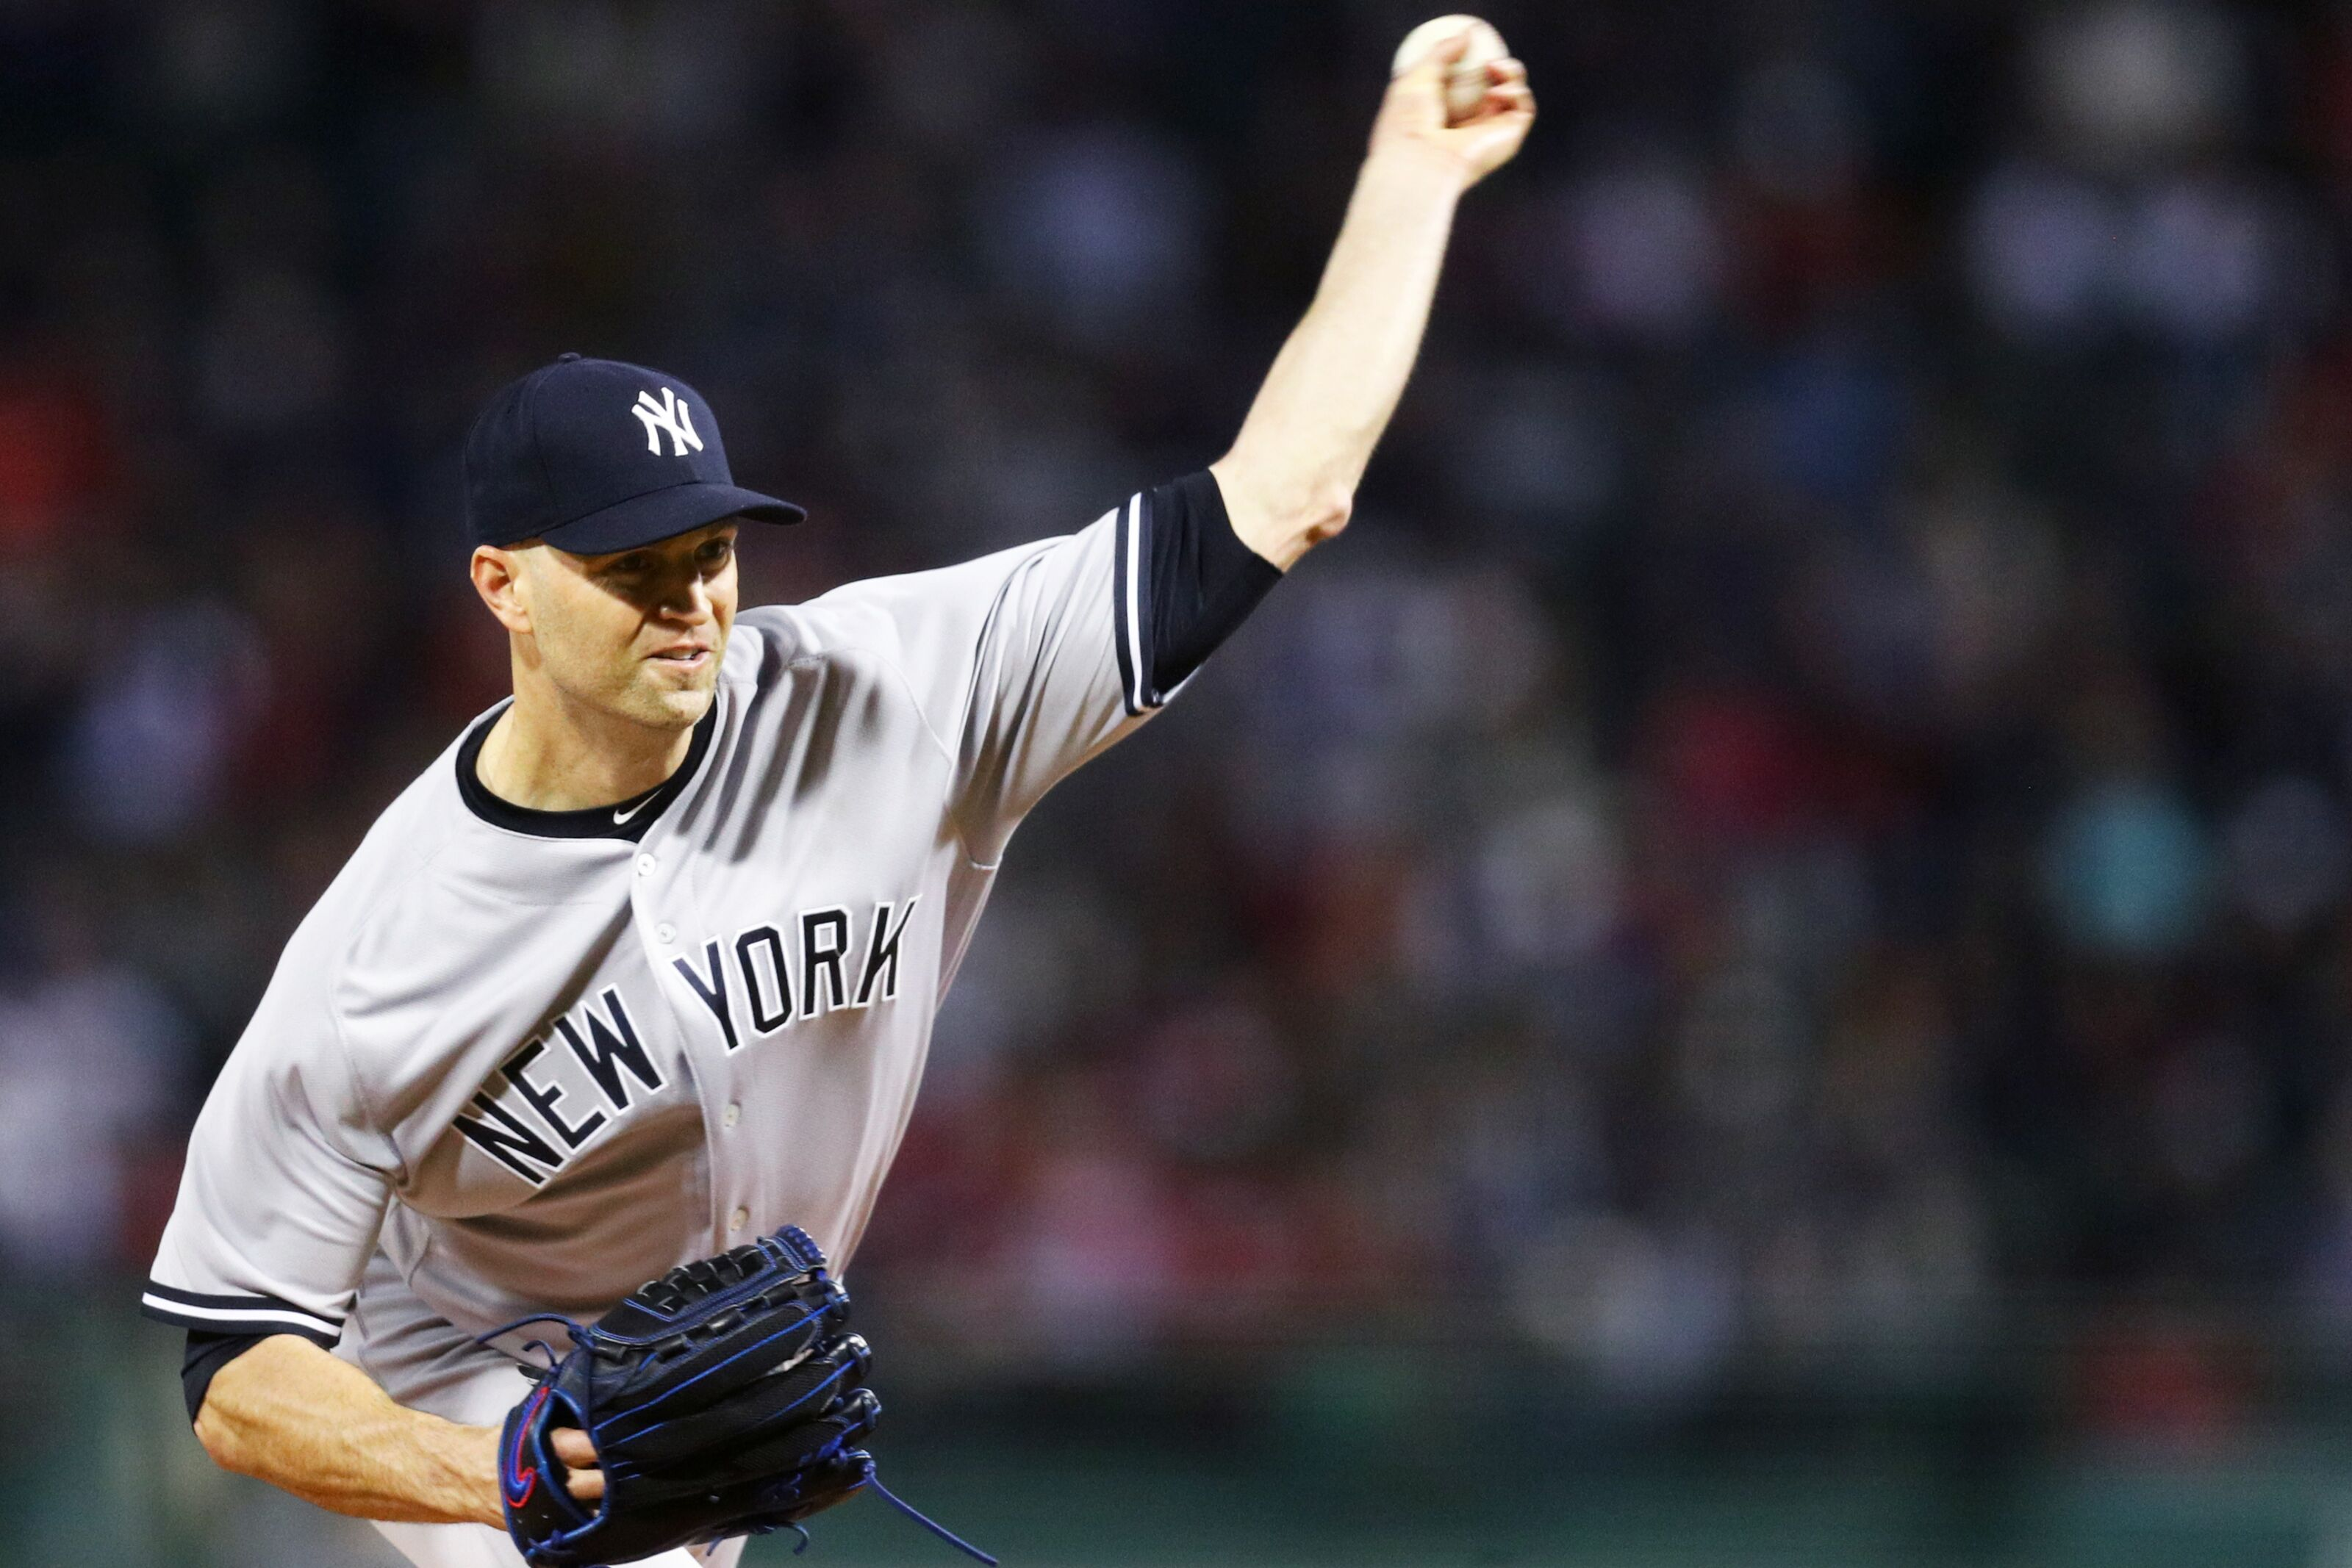 New York Yankees: J.A. Happ, team's 5th starter… for now